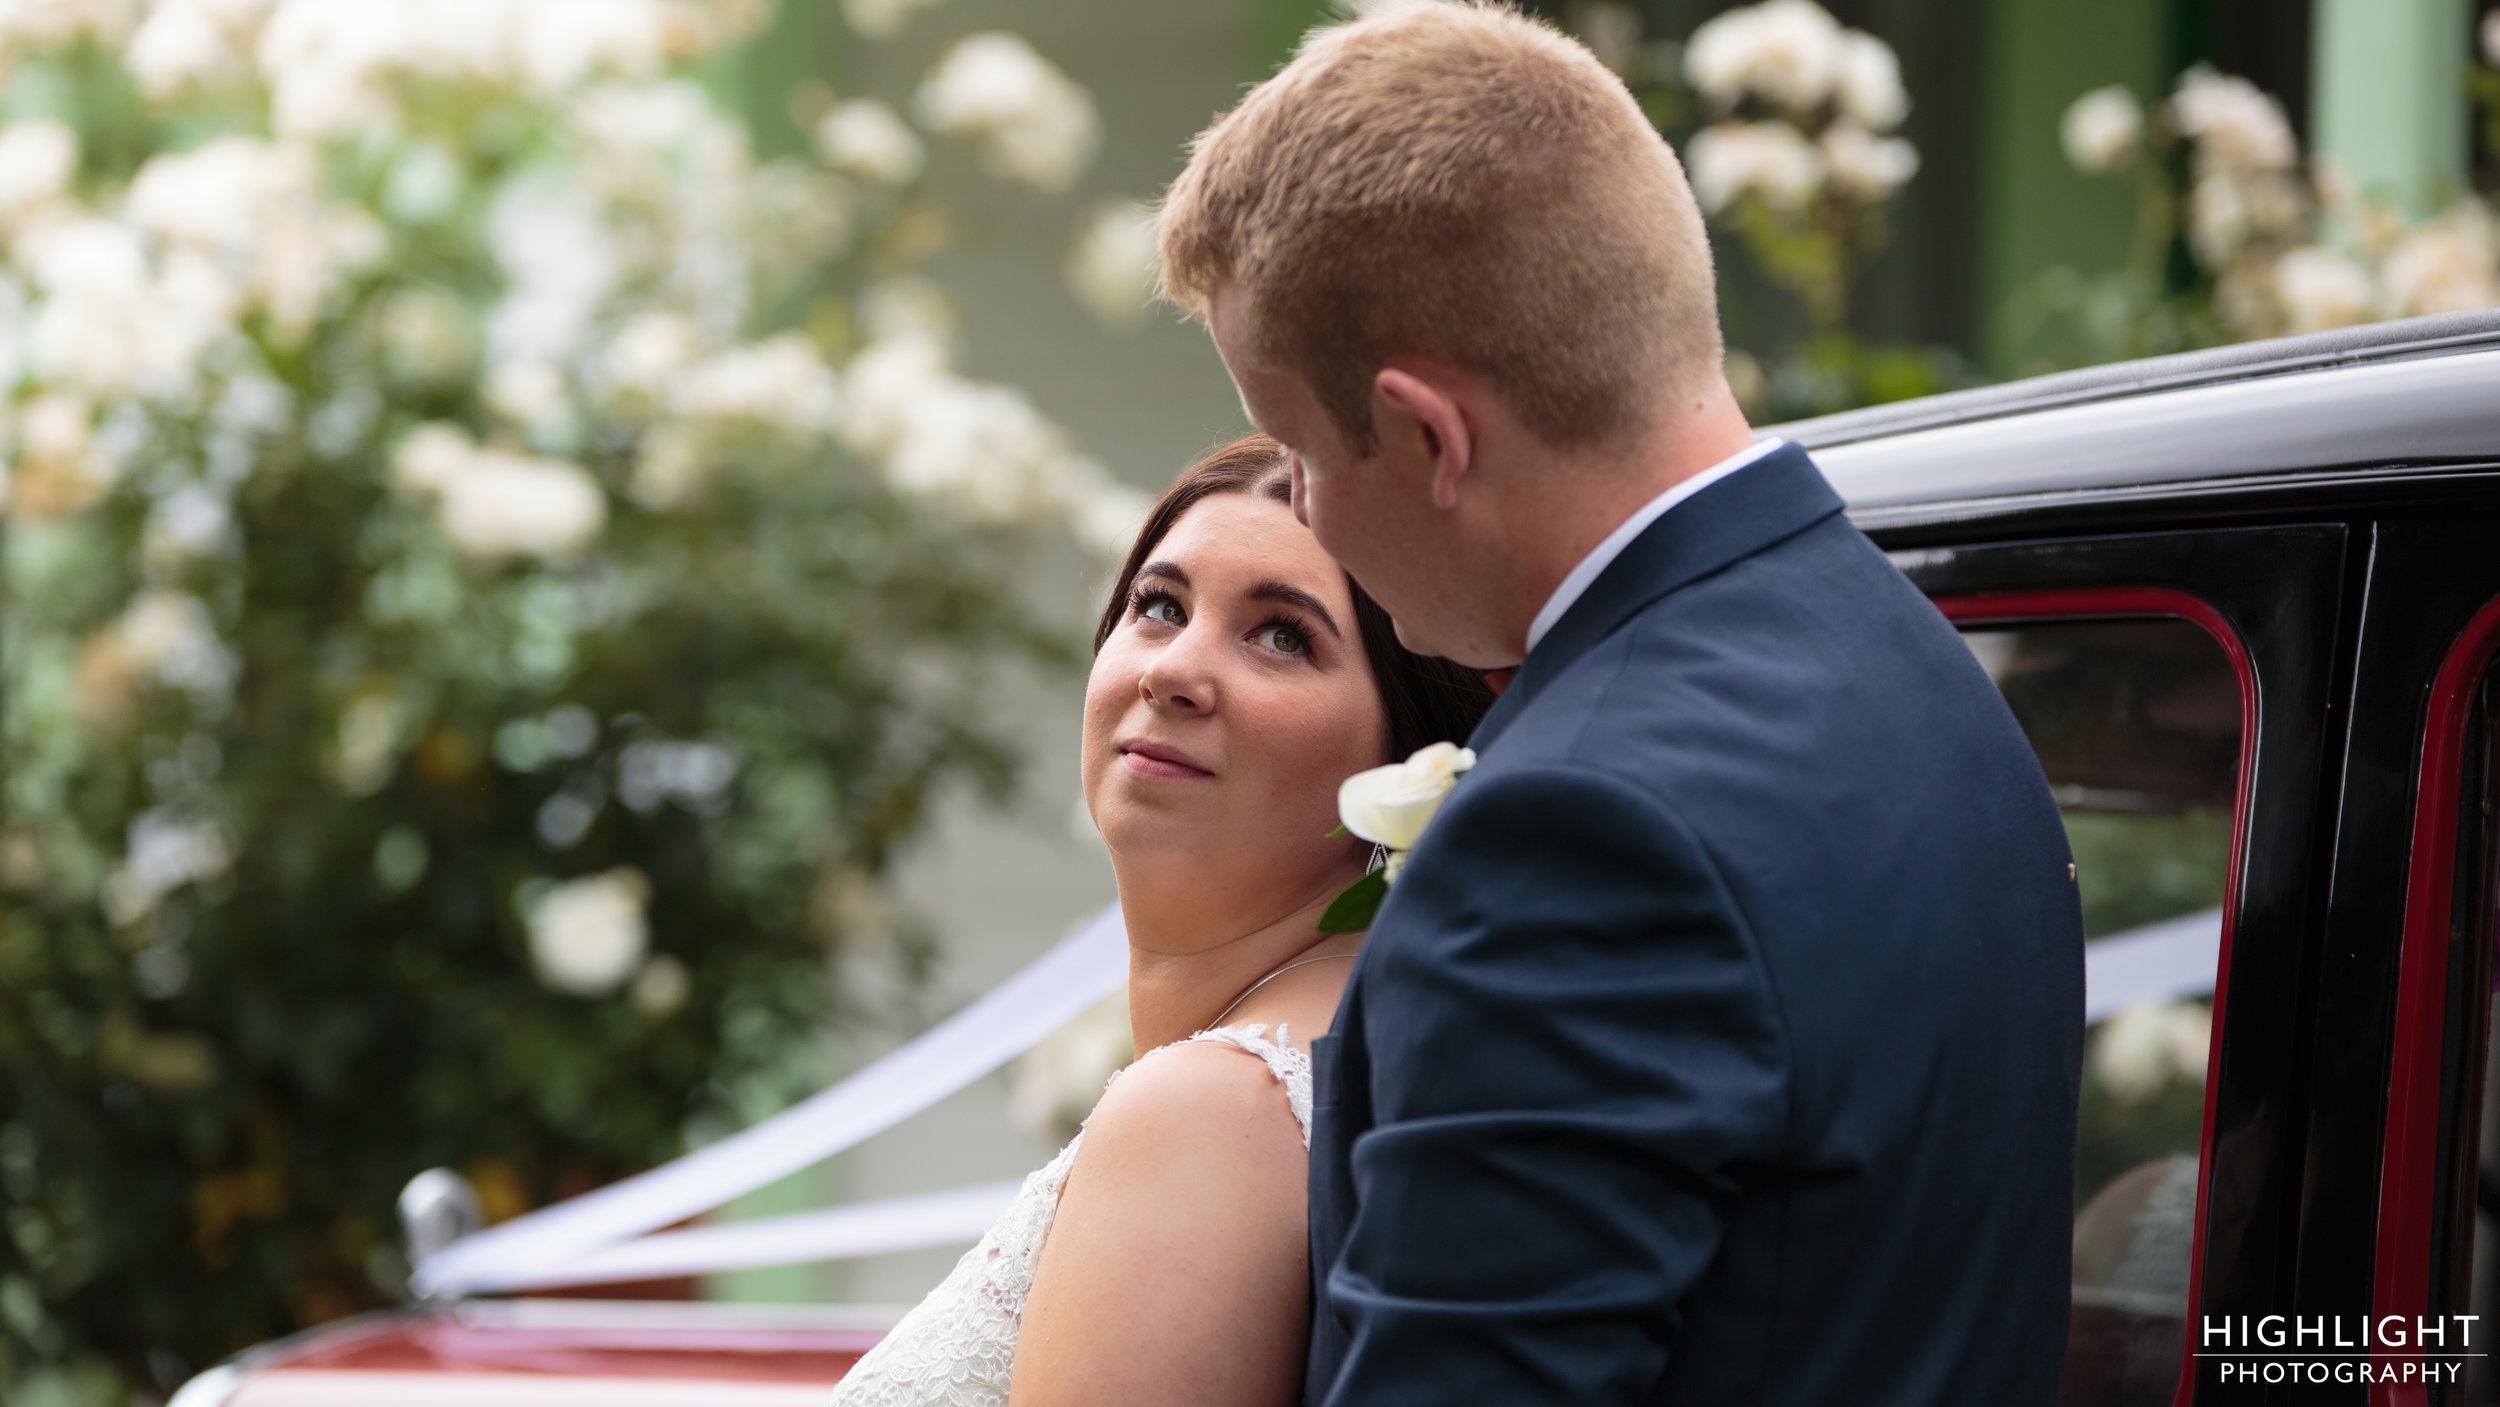 JM-2017-Highlight-wedding-photography-palmerston-north-new-zealand-145.jpg